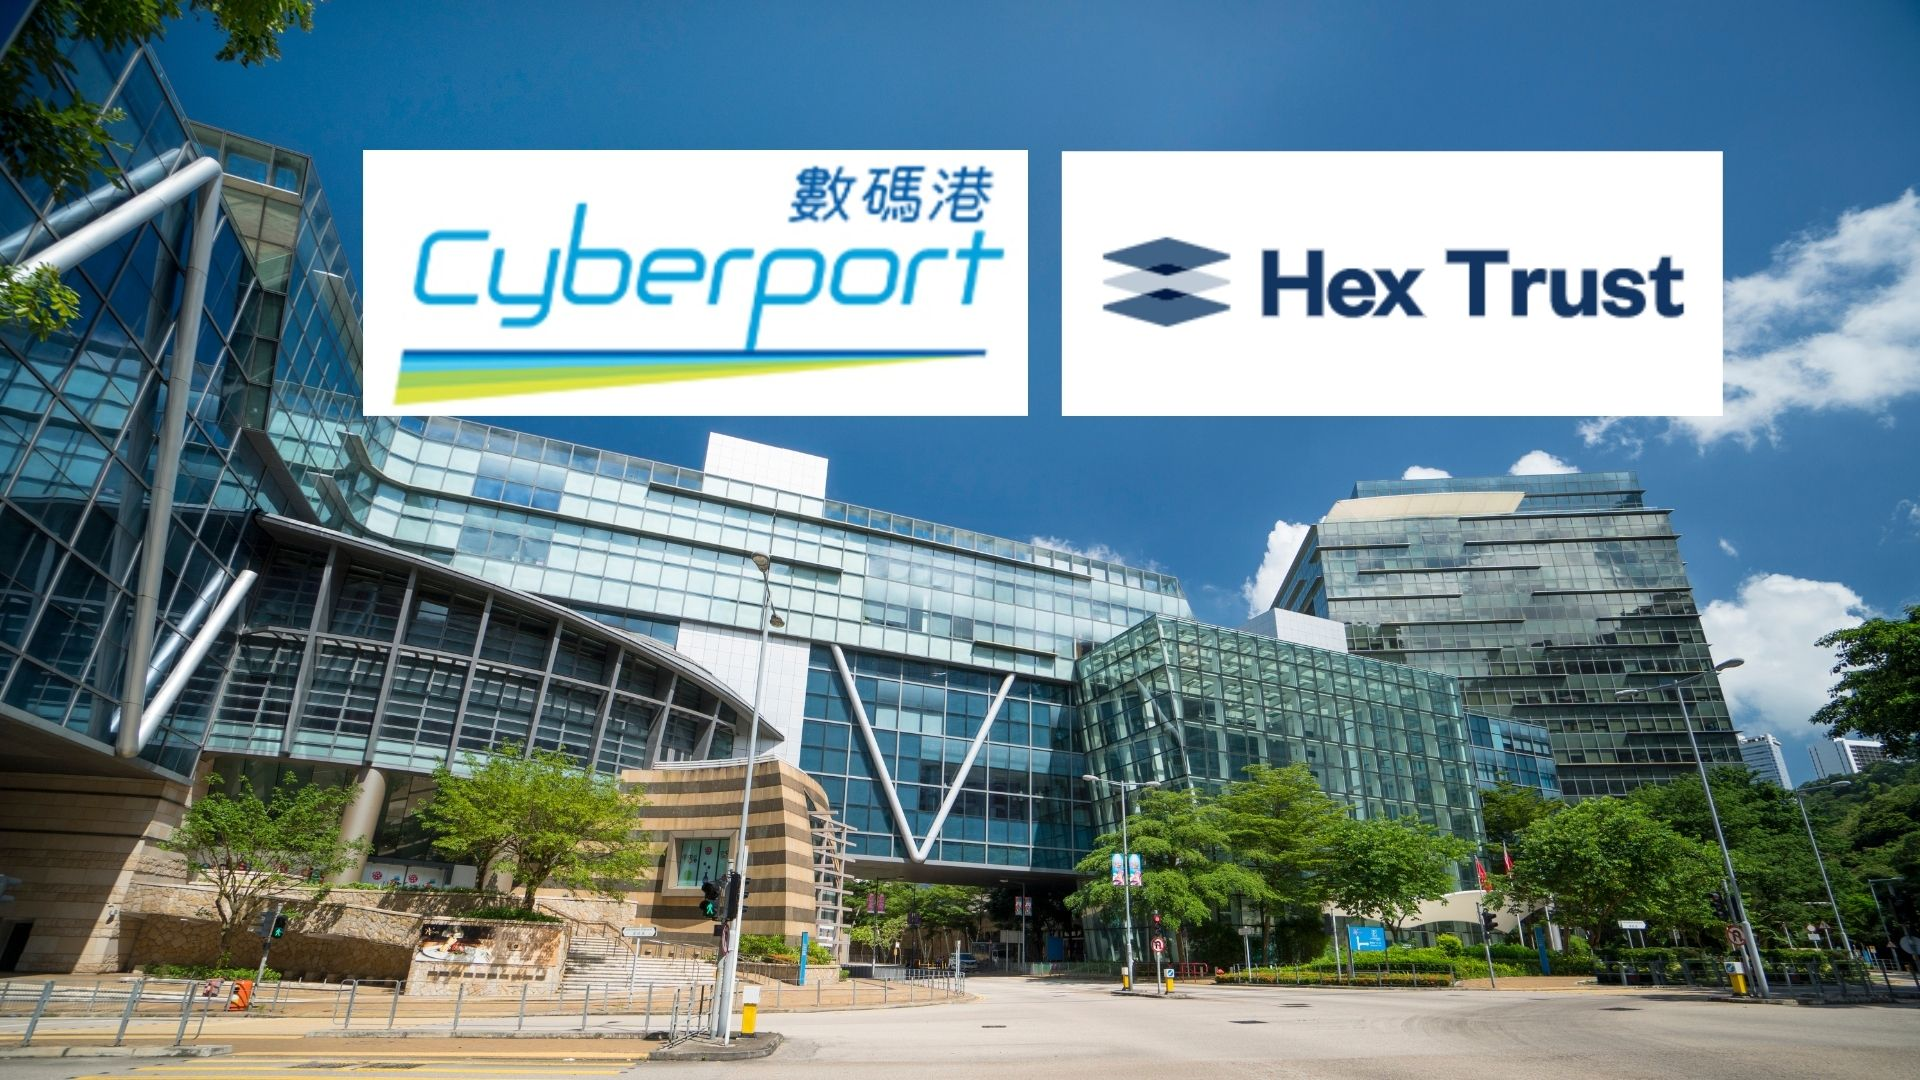 Hong Kong Cyberport with logos of Cyberport and Hex Trust, a digital asset custodian